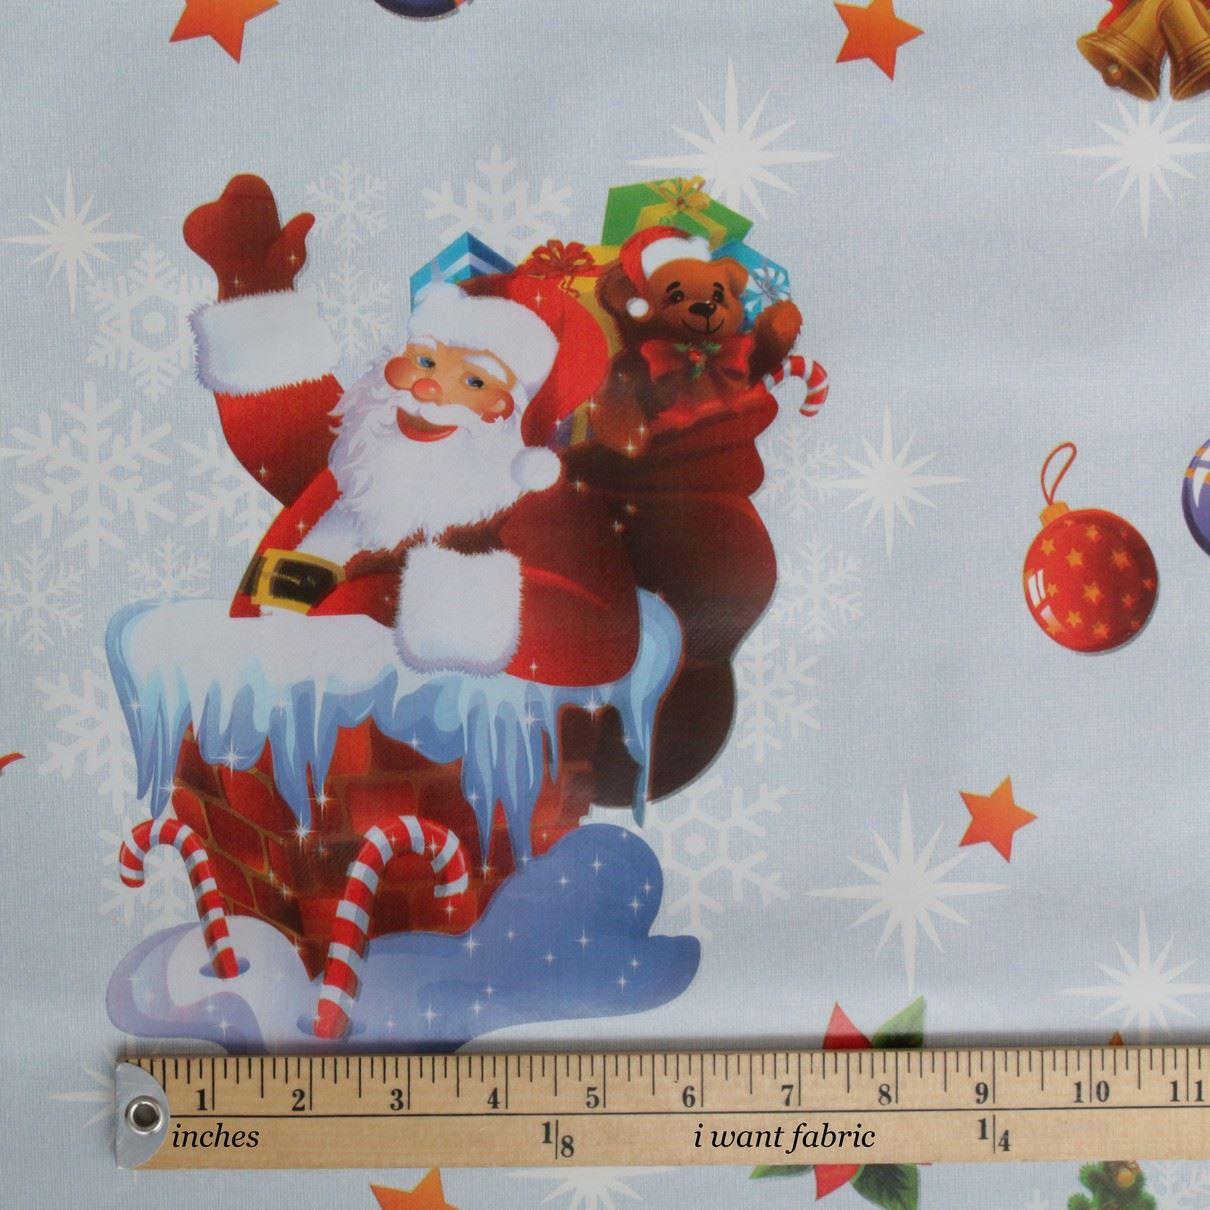 thumbnail 28 - CHRISTMAS PVC OILCLOTH VINYL FABRIC XMAS KITCHEN TABLE WIPECLEAN TABLECLOTHS